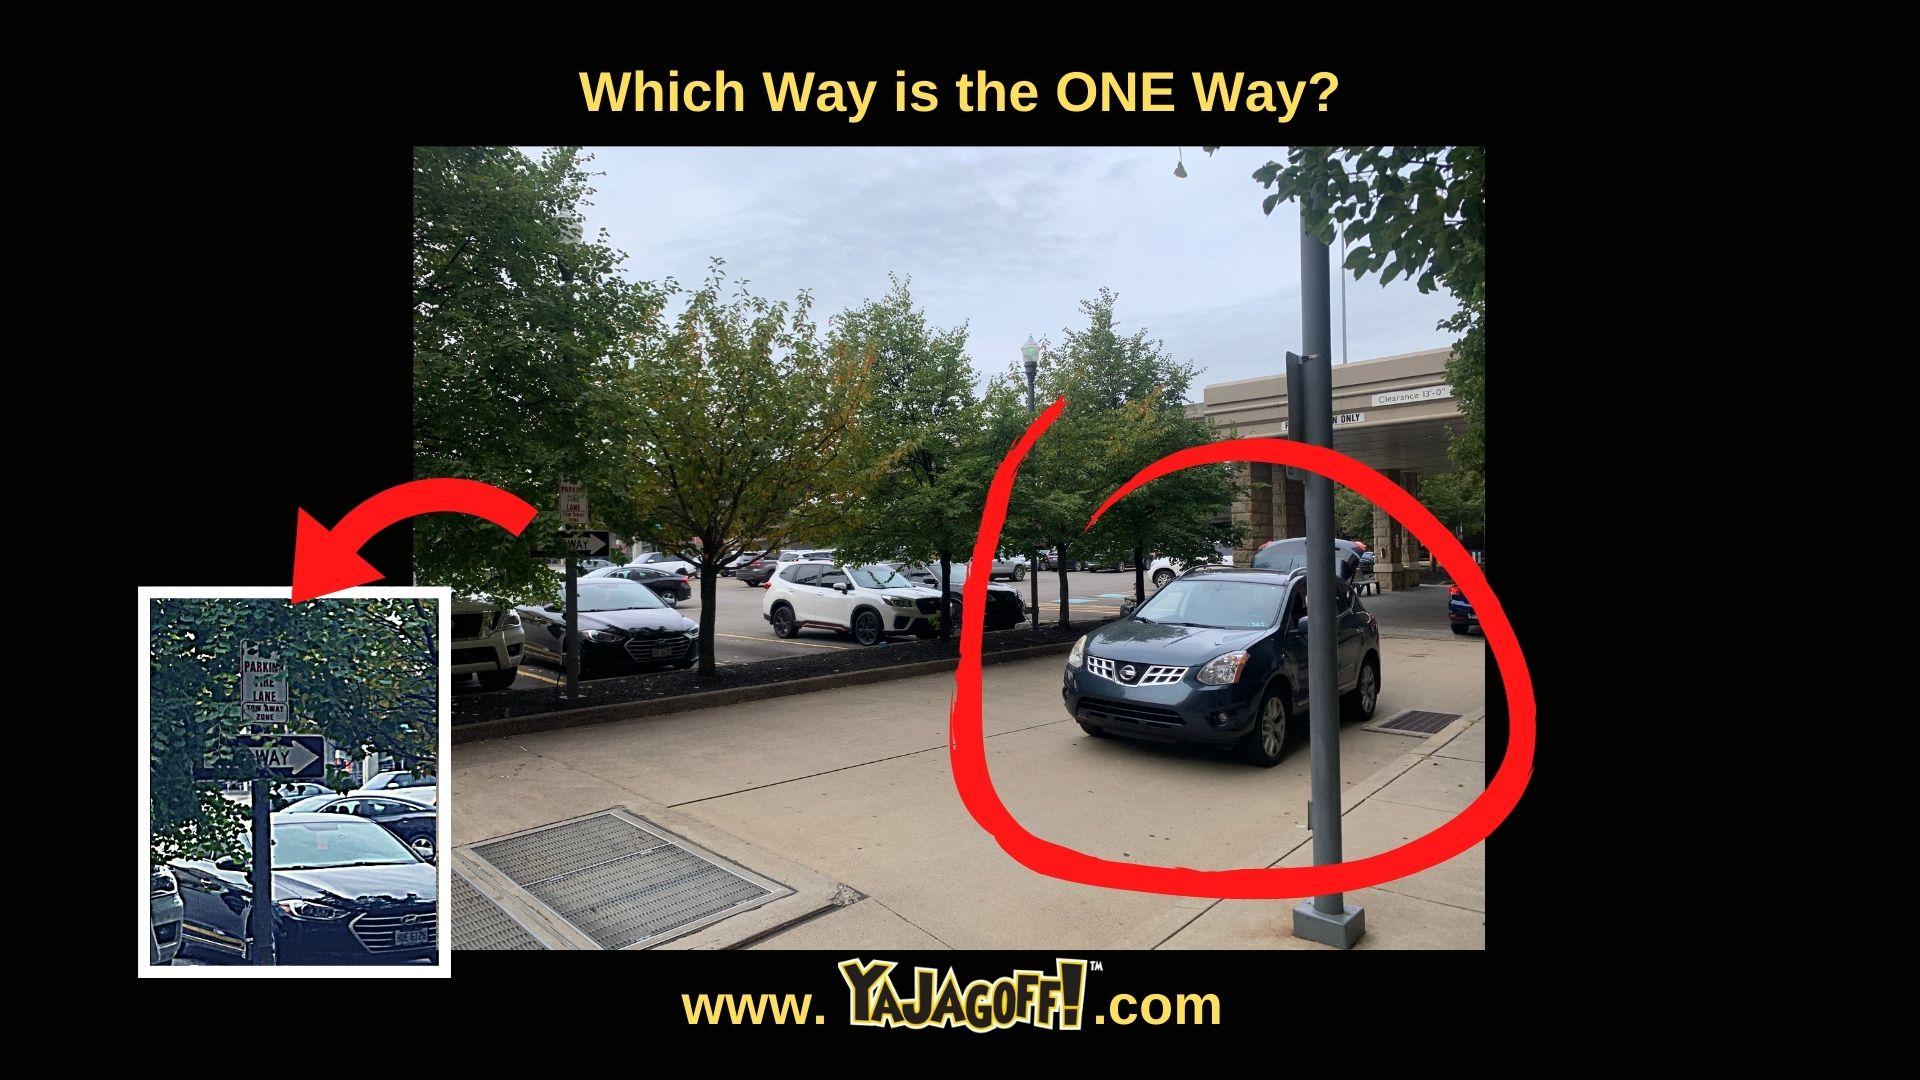 Jagoff Drivers on One Way Lane